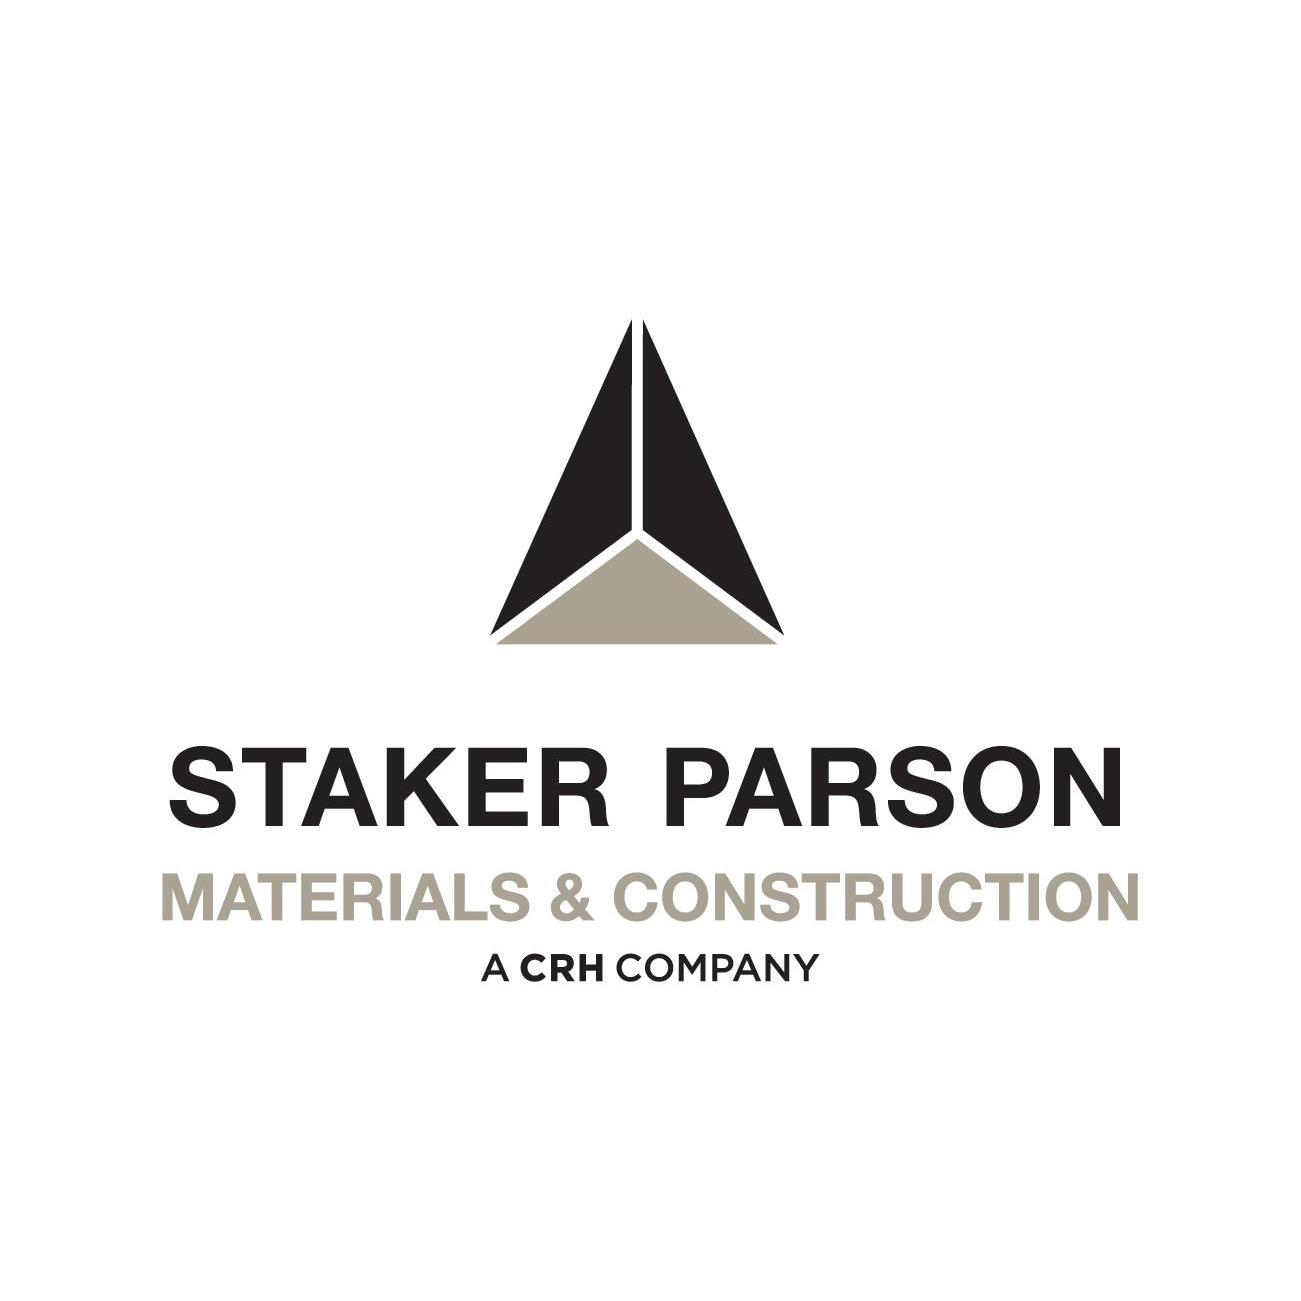 Staker Parson Materials & Construction, A CRH Company Logo